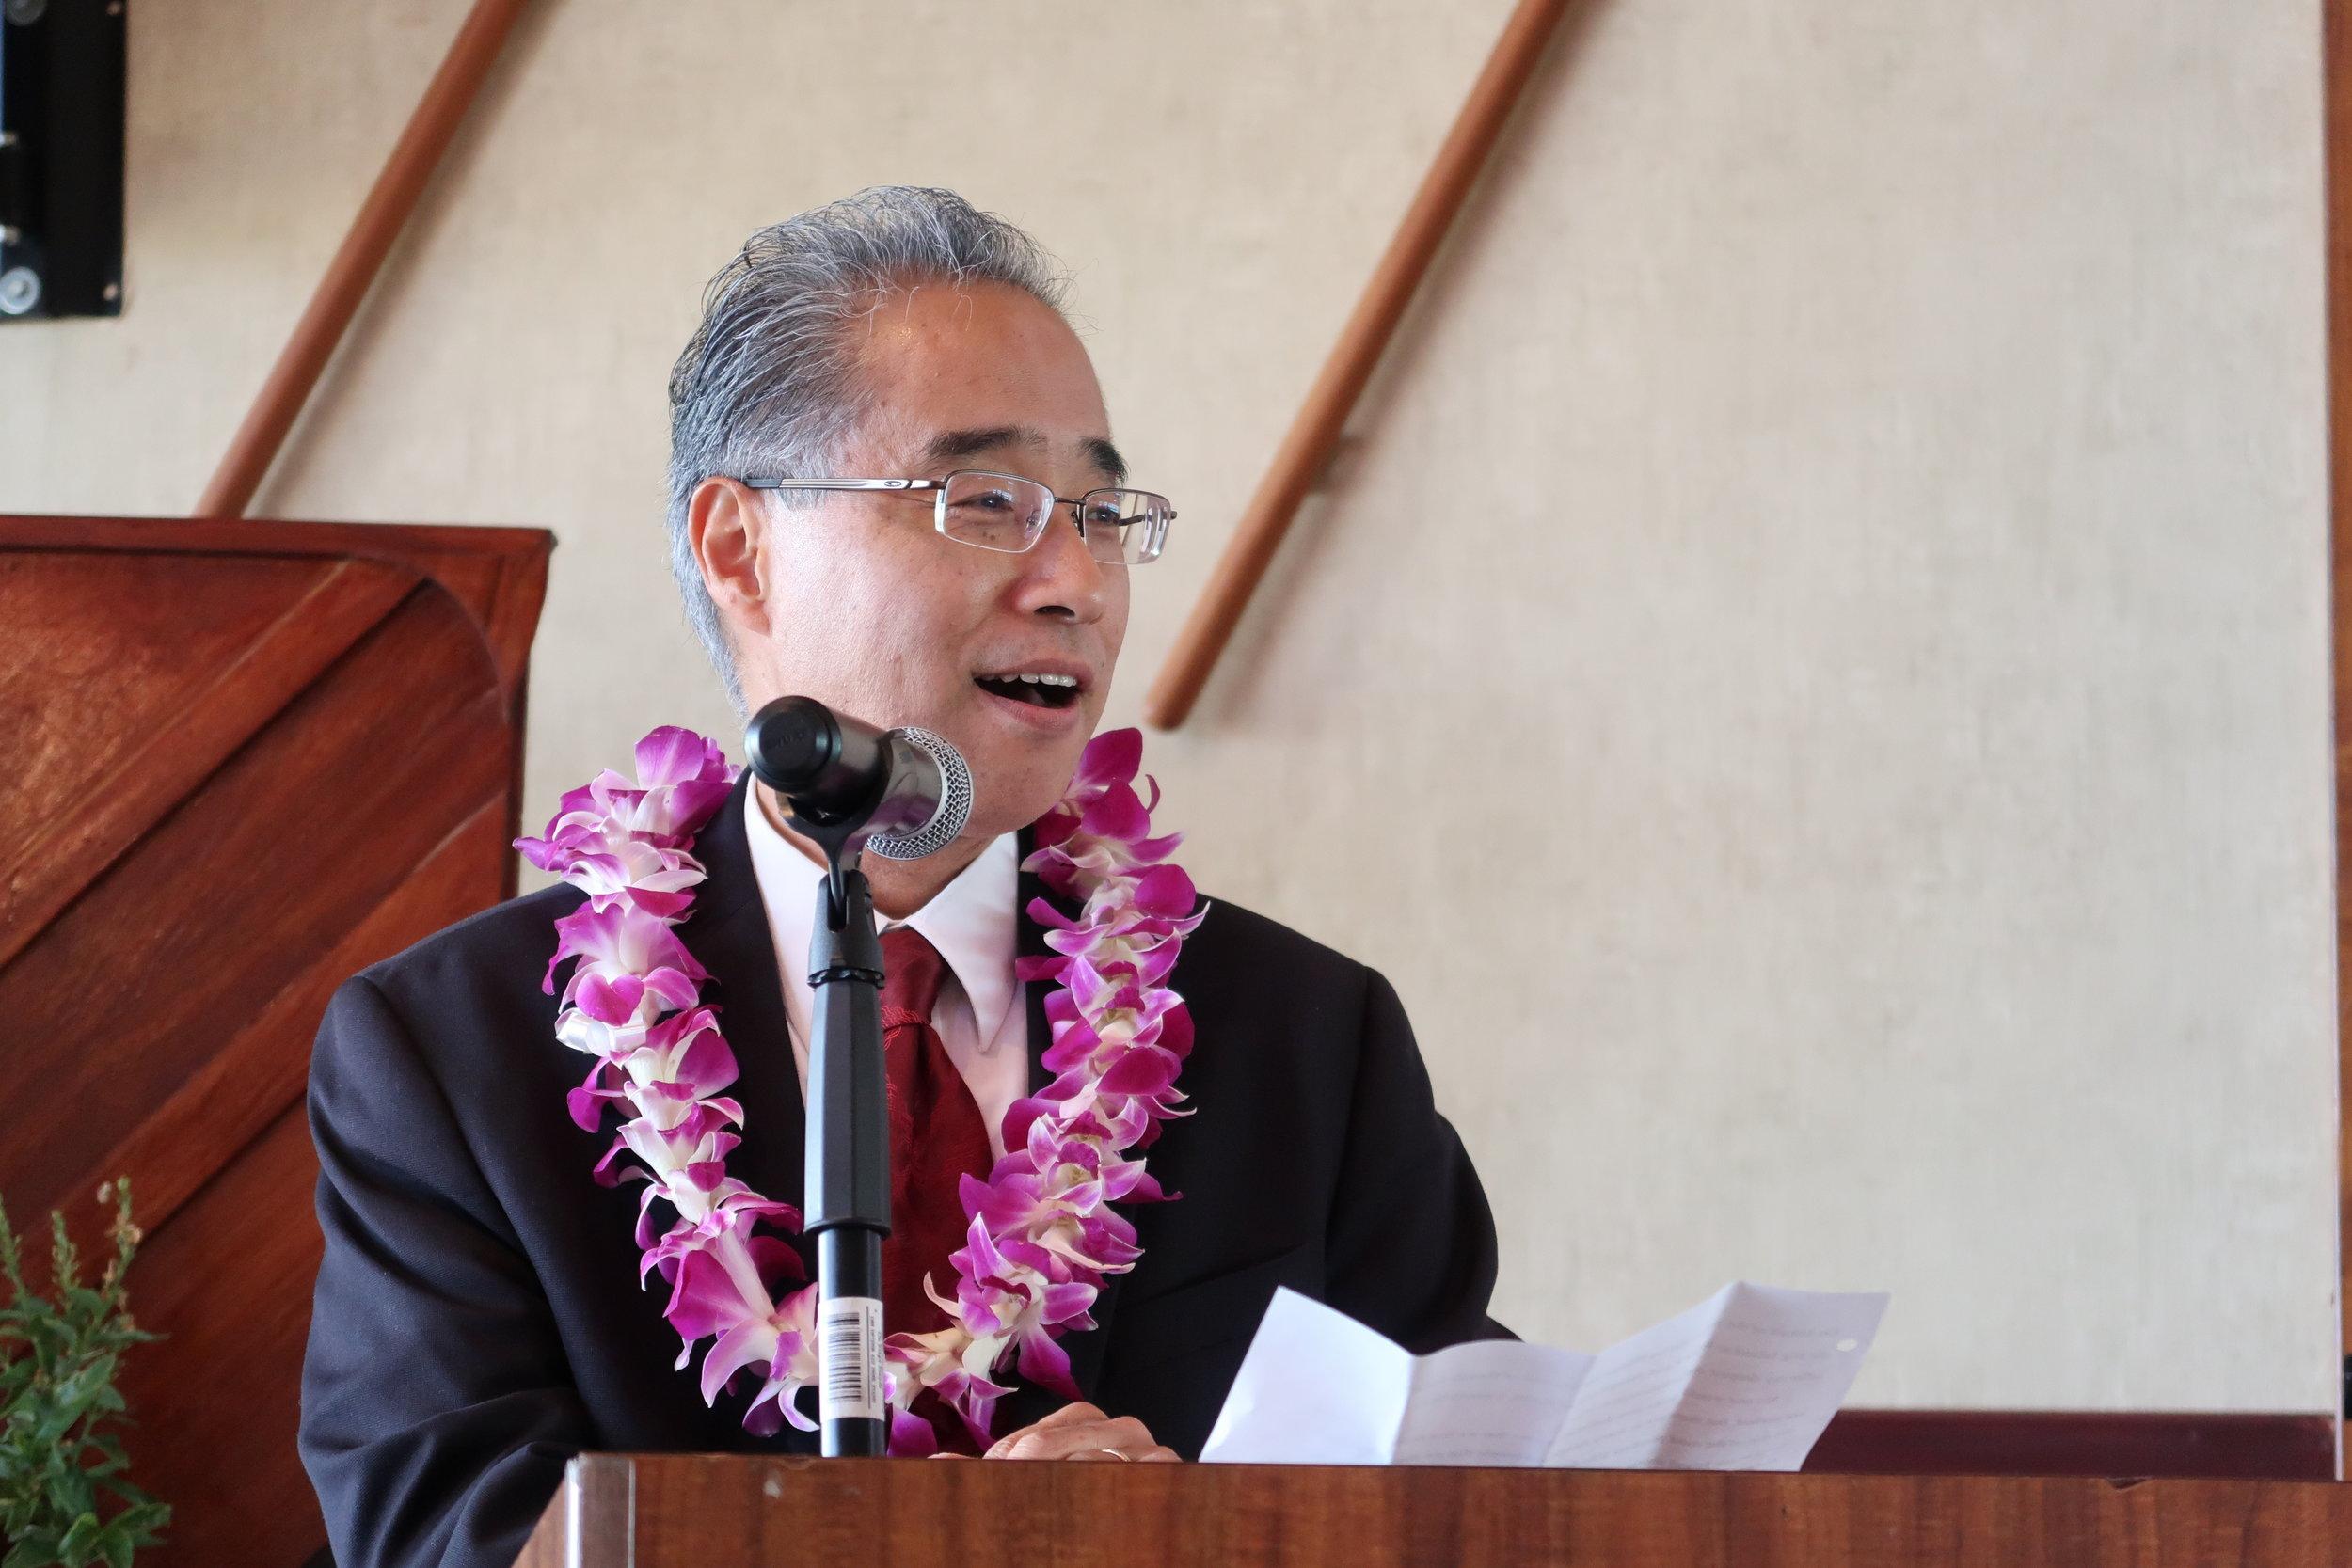 Bishop Eric Matsumoto gives his congratulatory message